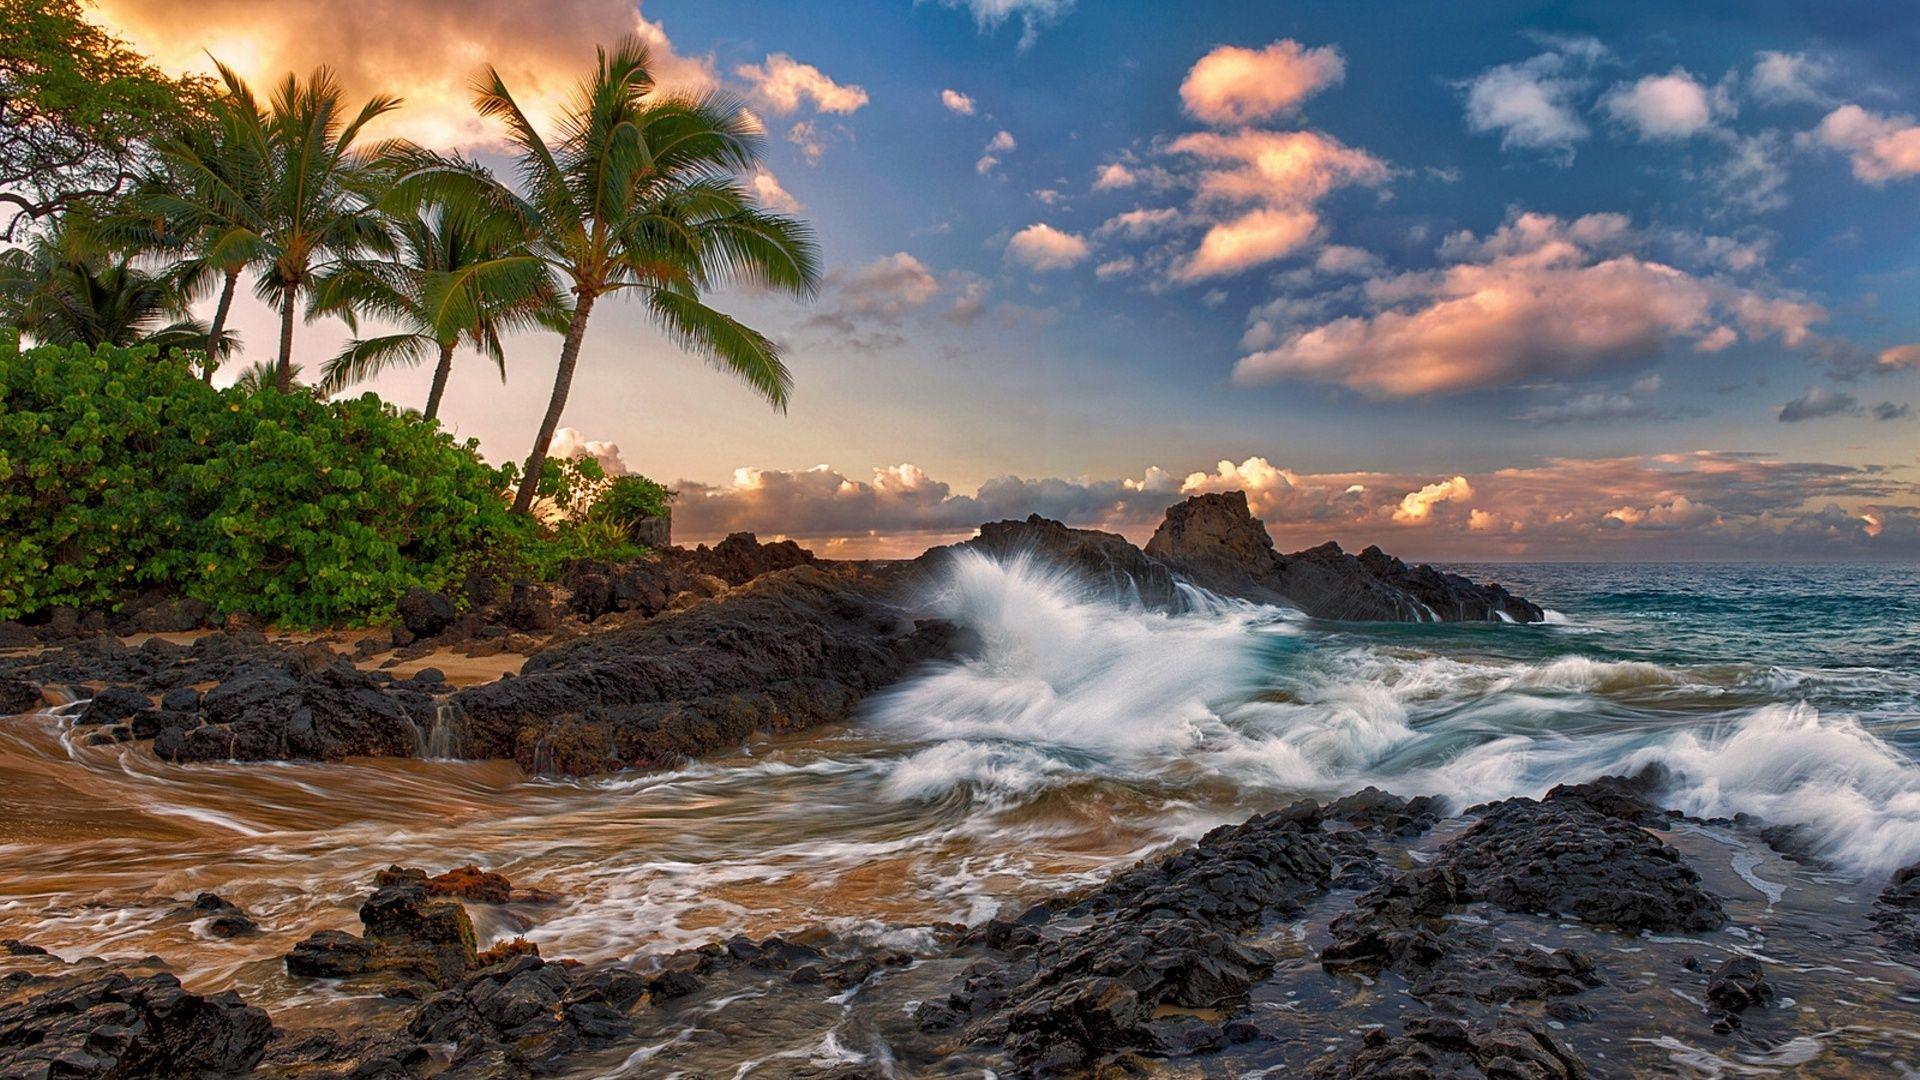 Maui Desktop Wallpaper Pictures Alpha Coders Wallpaper